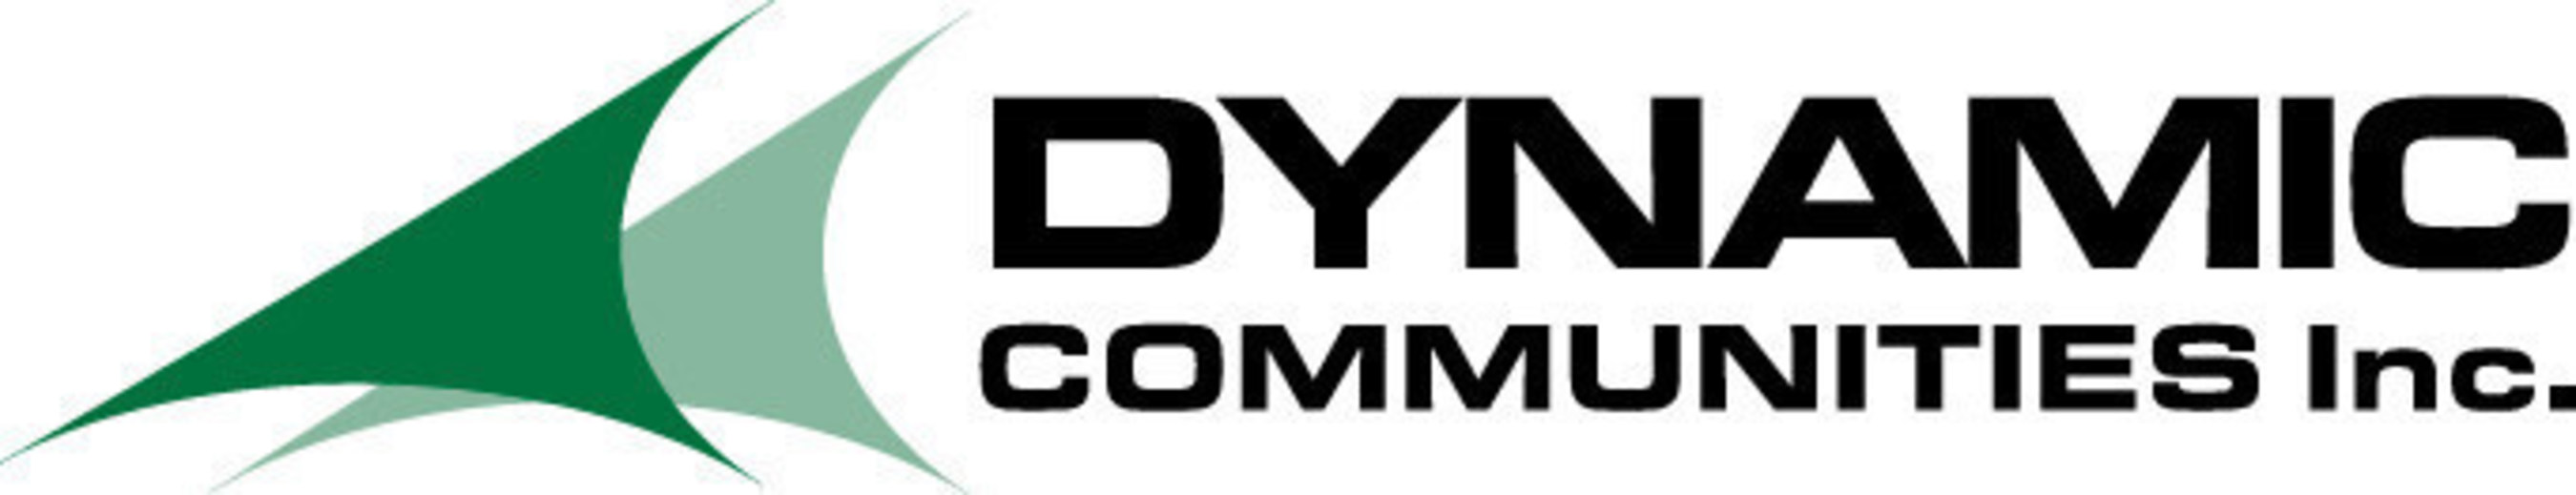 Dynamic Communities, Inc.